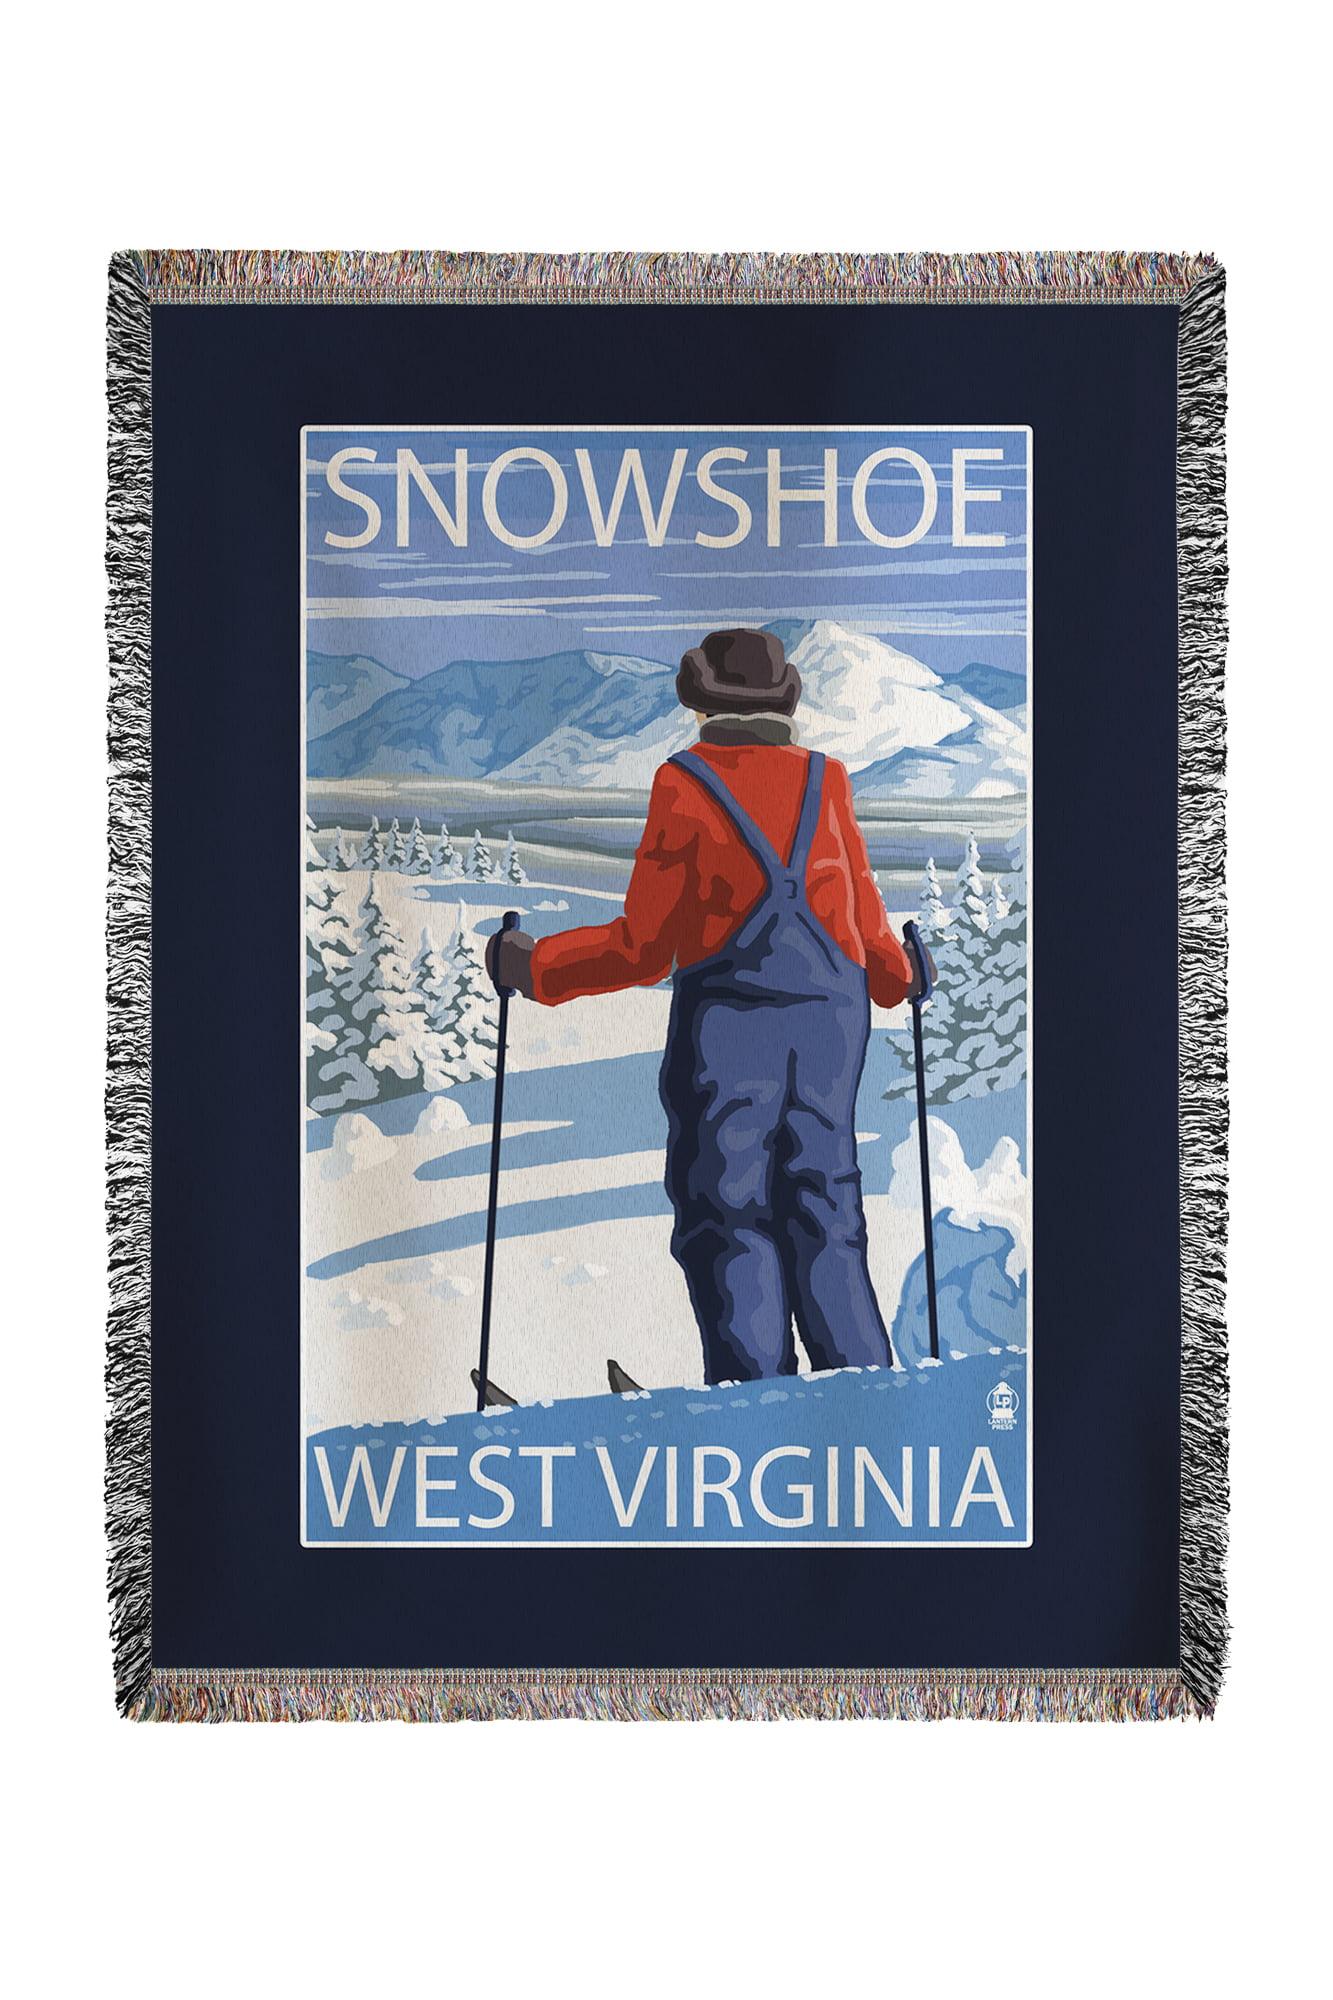 Snowshoe, West Virginia Skier Admiring View Lantern Press Poster (60x80 Woven Chenille Yarn Blanket) by Lantern Press